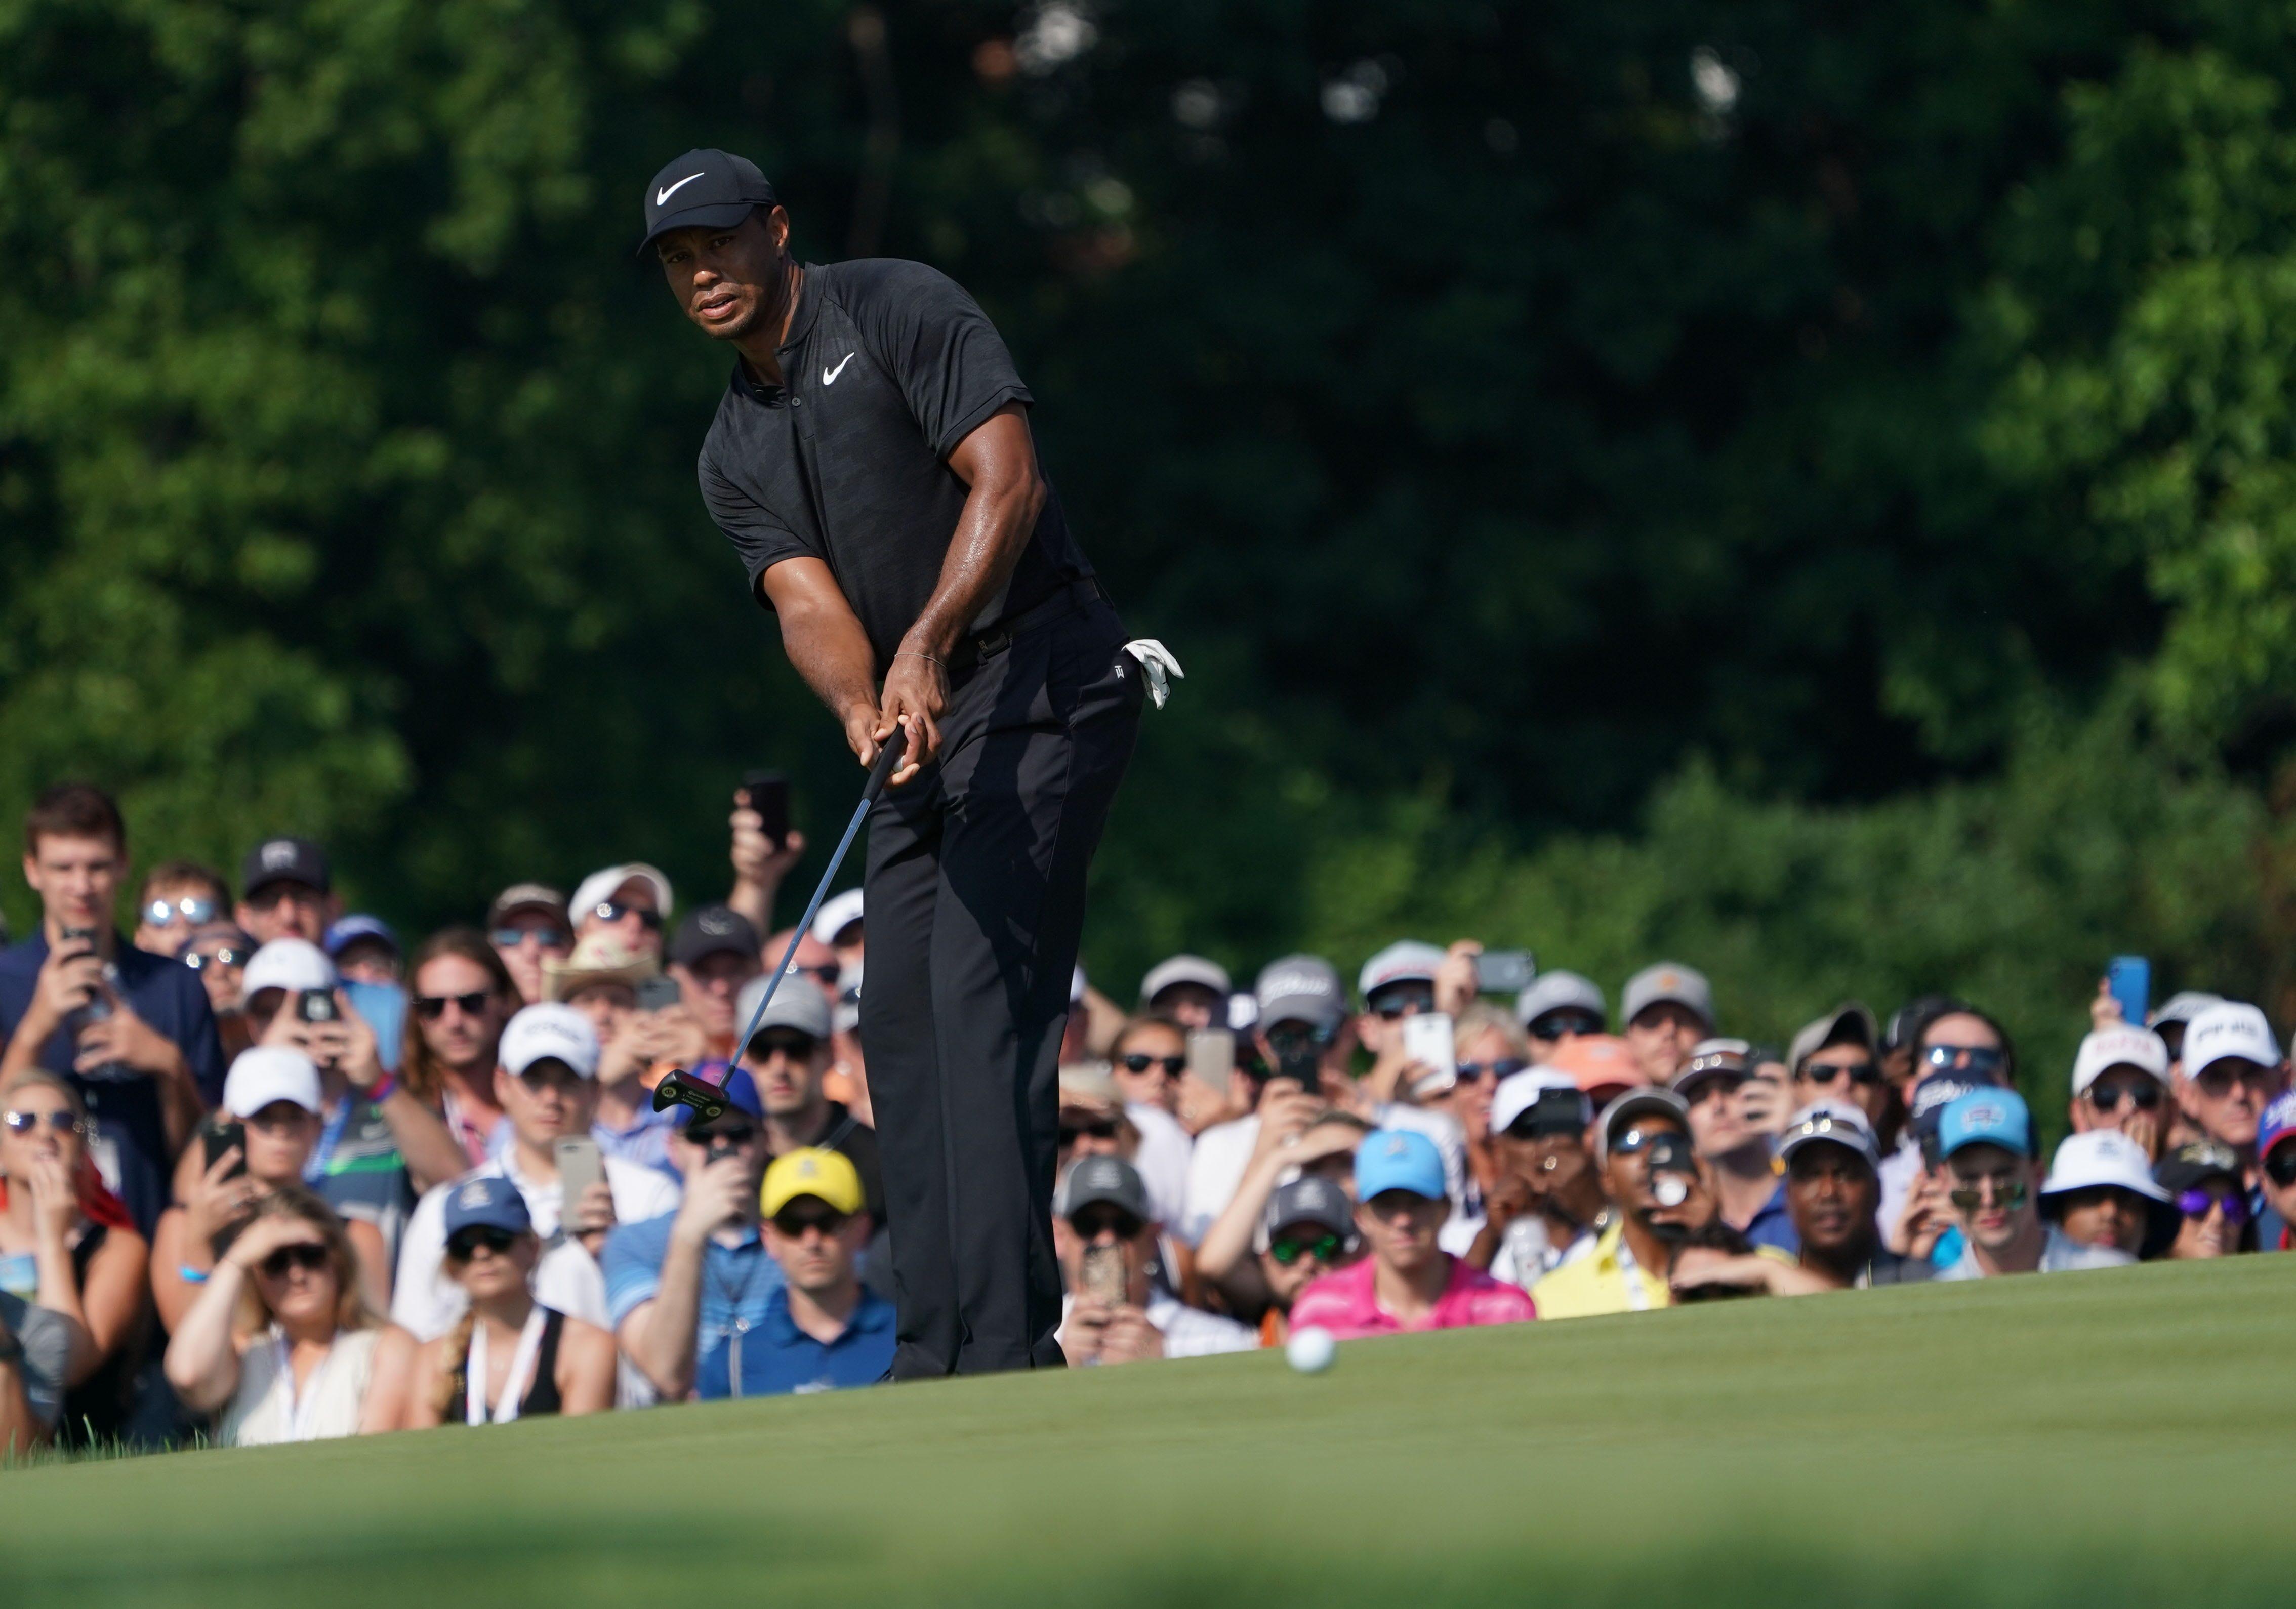 Tiger Tracker: Follow along as Tiger Woods looks to make a run Saturday at the PGA Championship